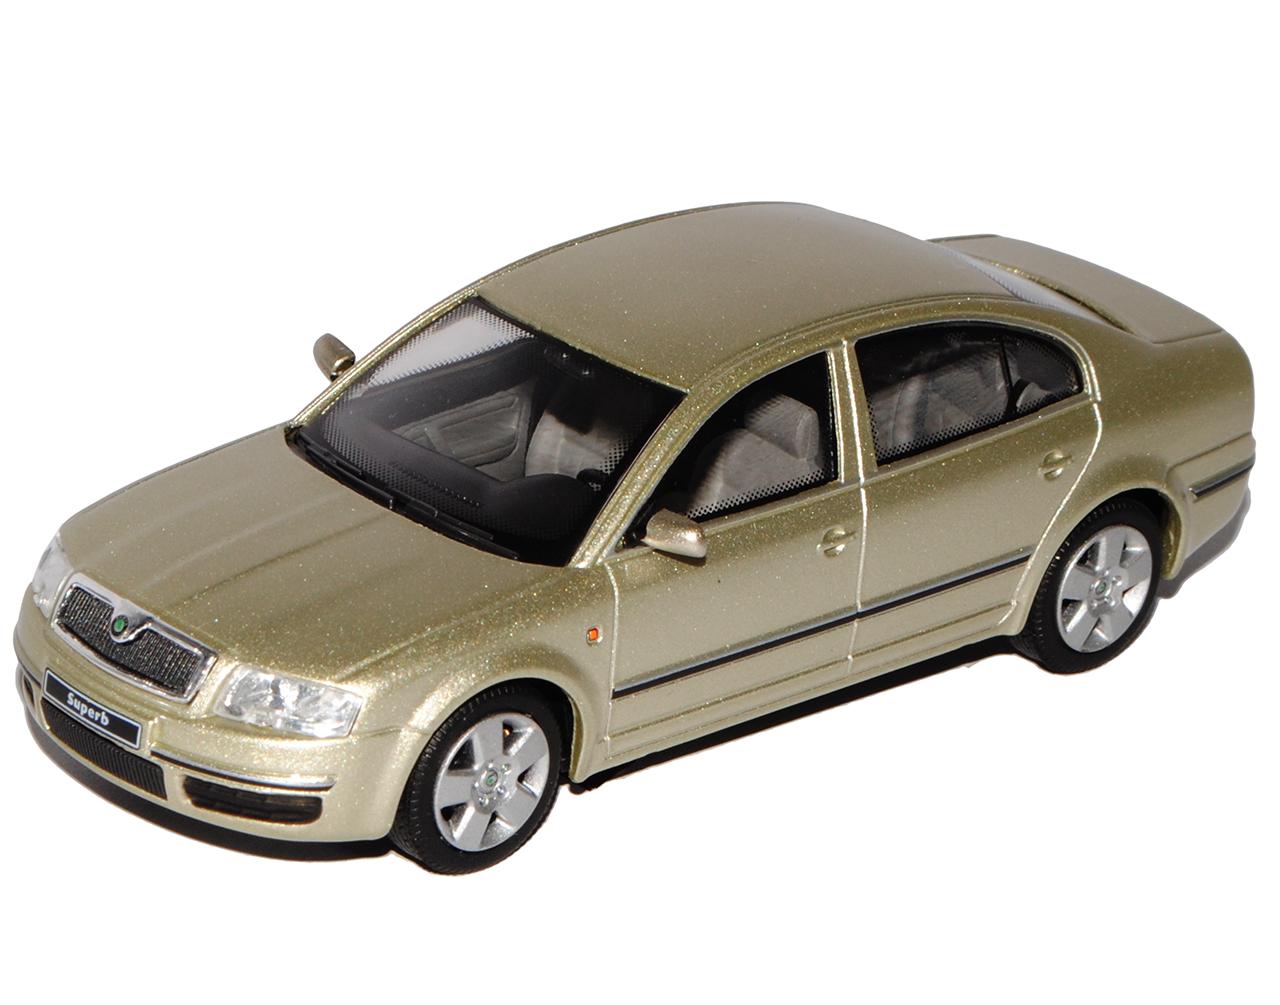 Skoda Superb I Limousine Sahara Beige Metallic 003Y 2001-2008 1//43 Abrex Model..